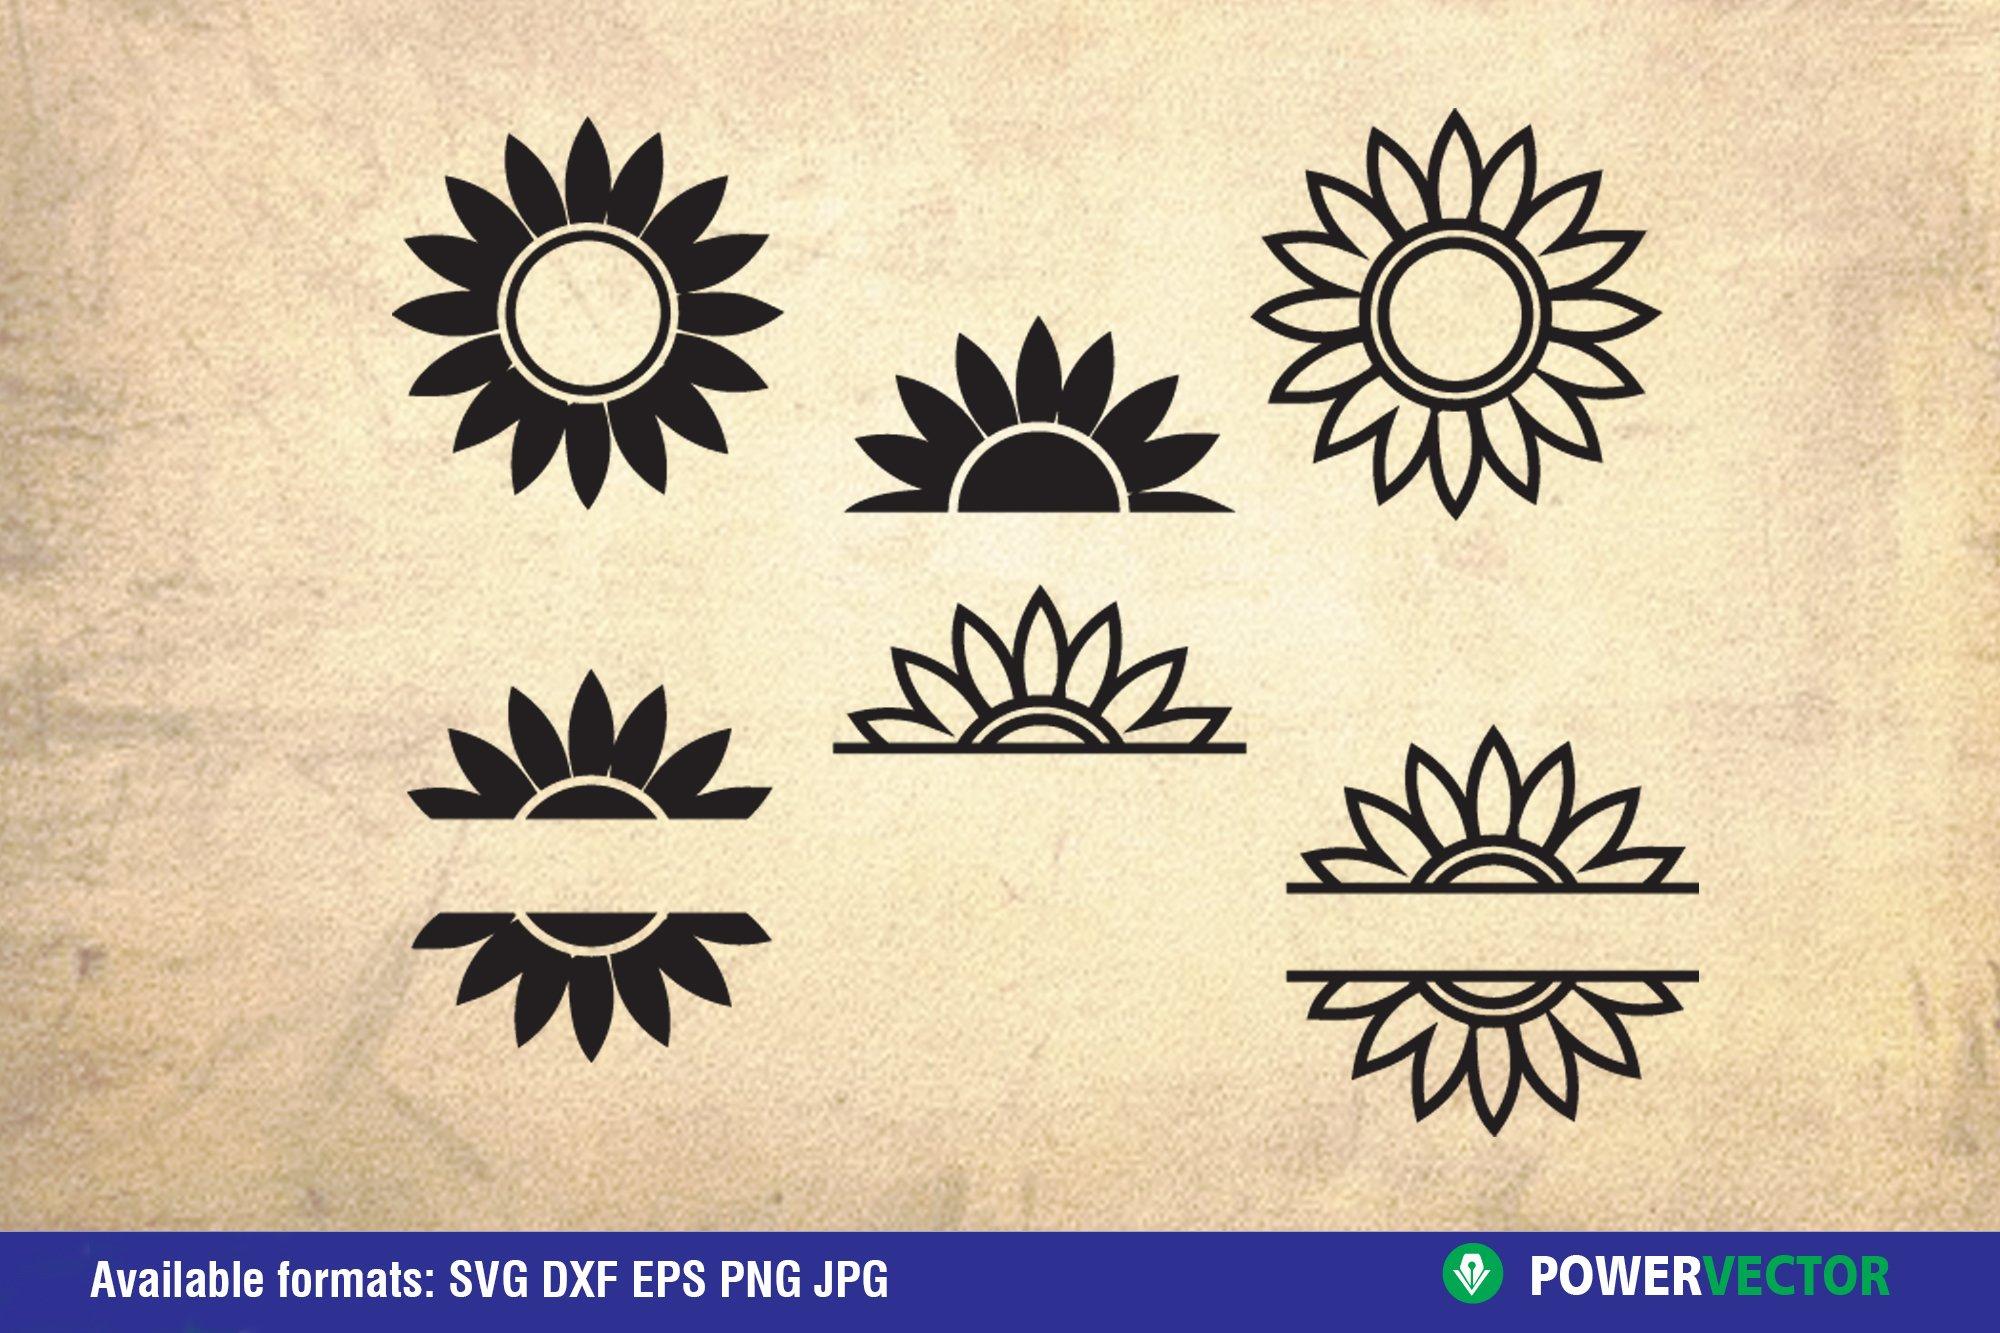 Flowers and Laurel Wreaths SVG Bundle example image 6